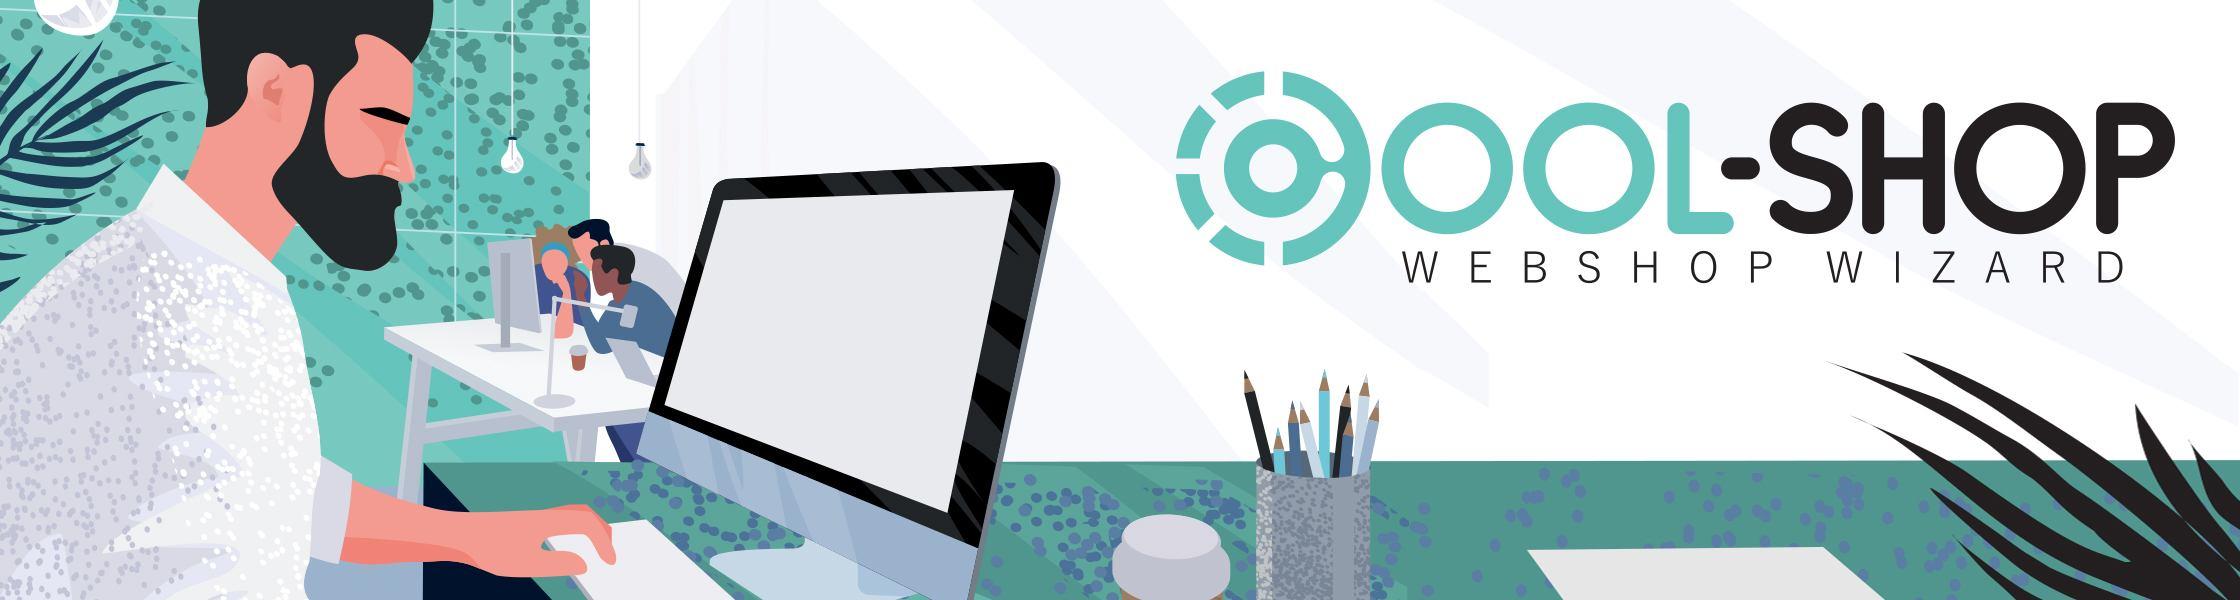 Creati webshopul dvs de la zero in doar 5 minute, in 5 pasi, gratuit!